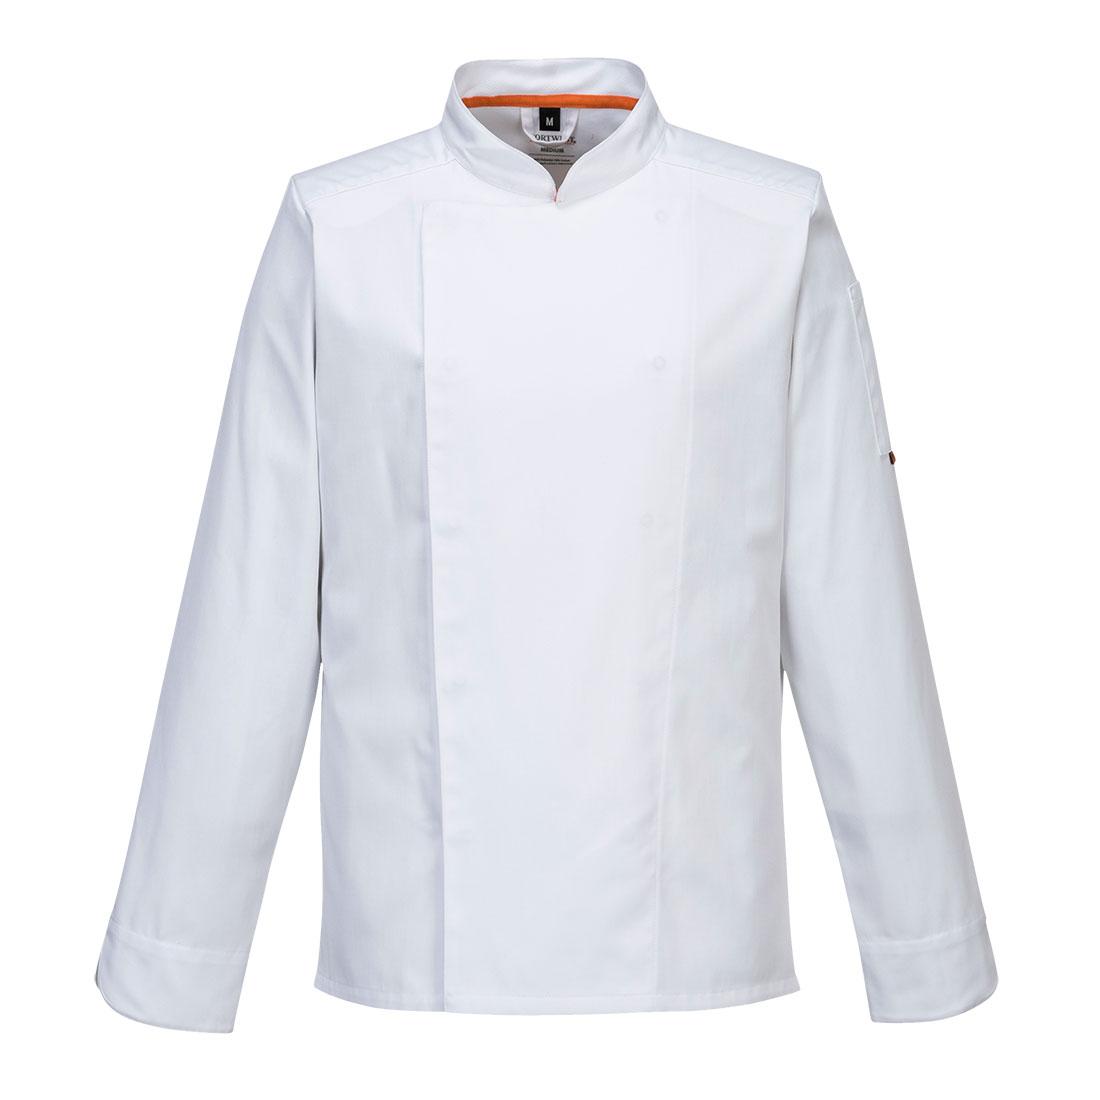 MeshAir Pro Jacket  L/S White MR